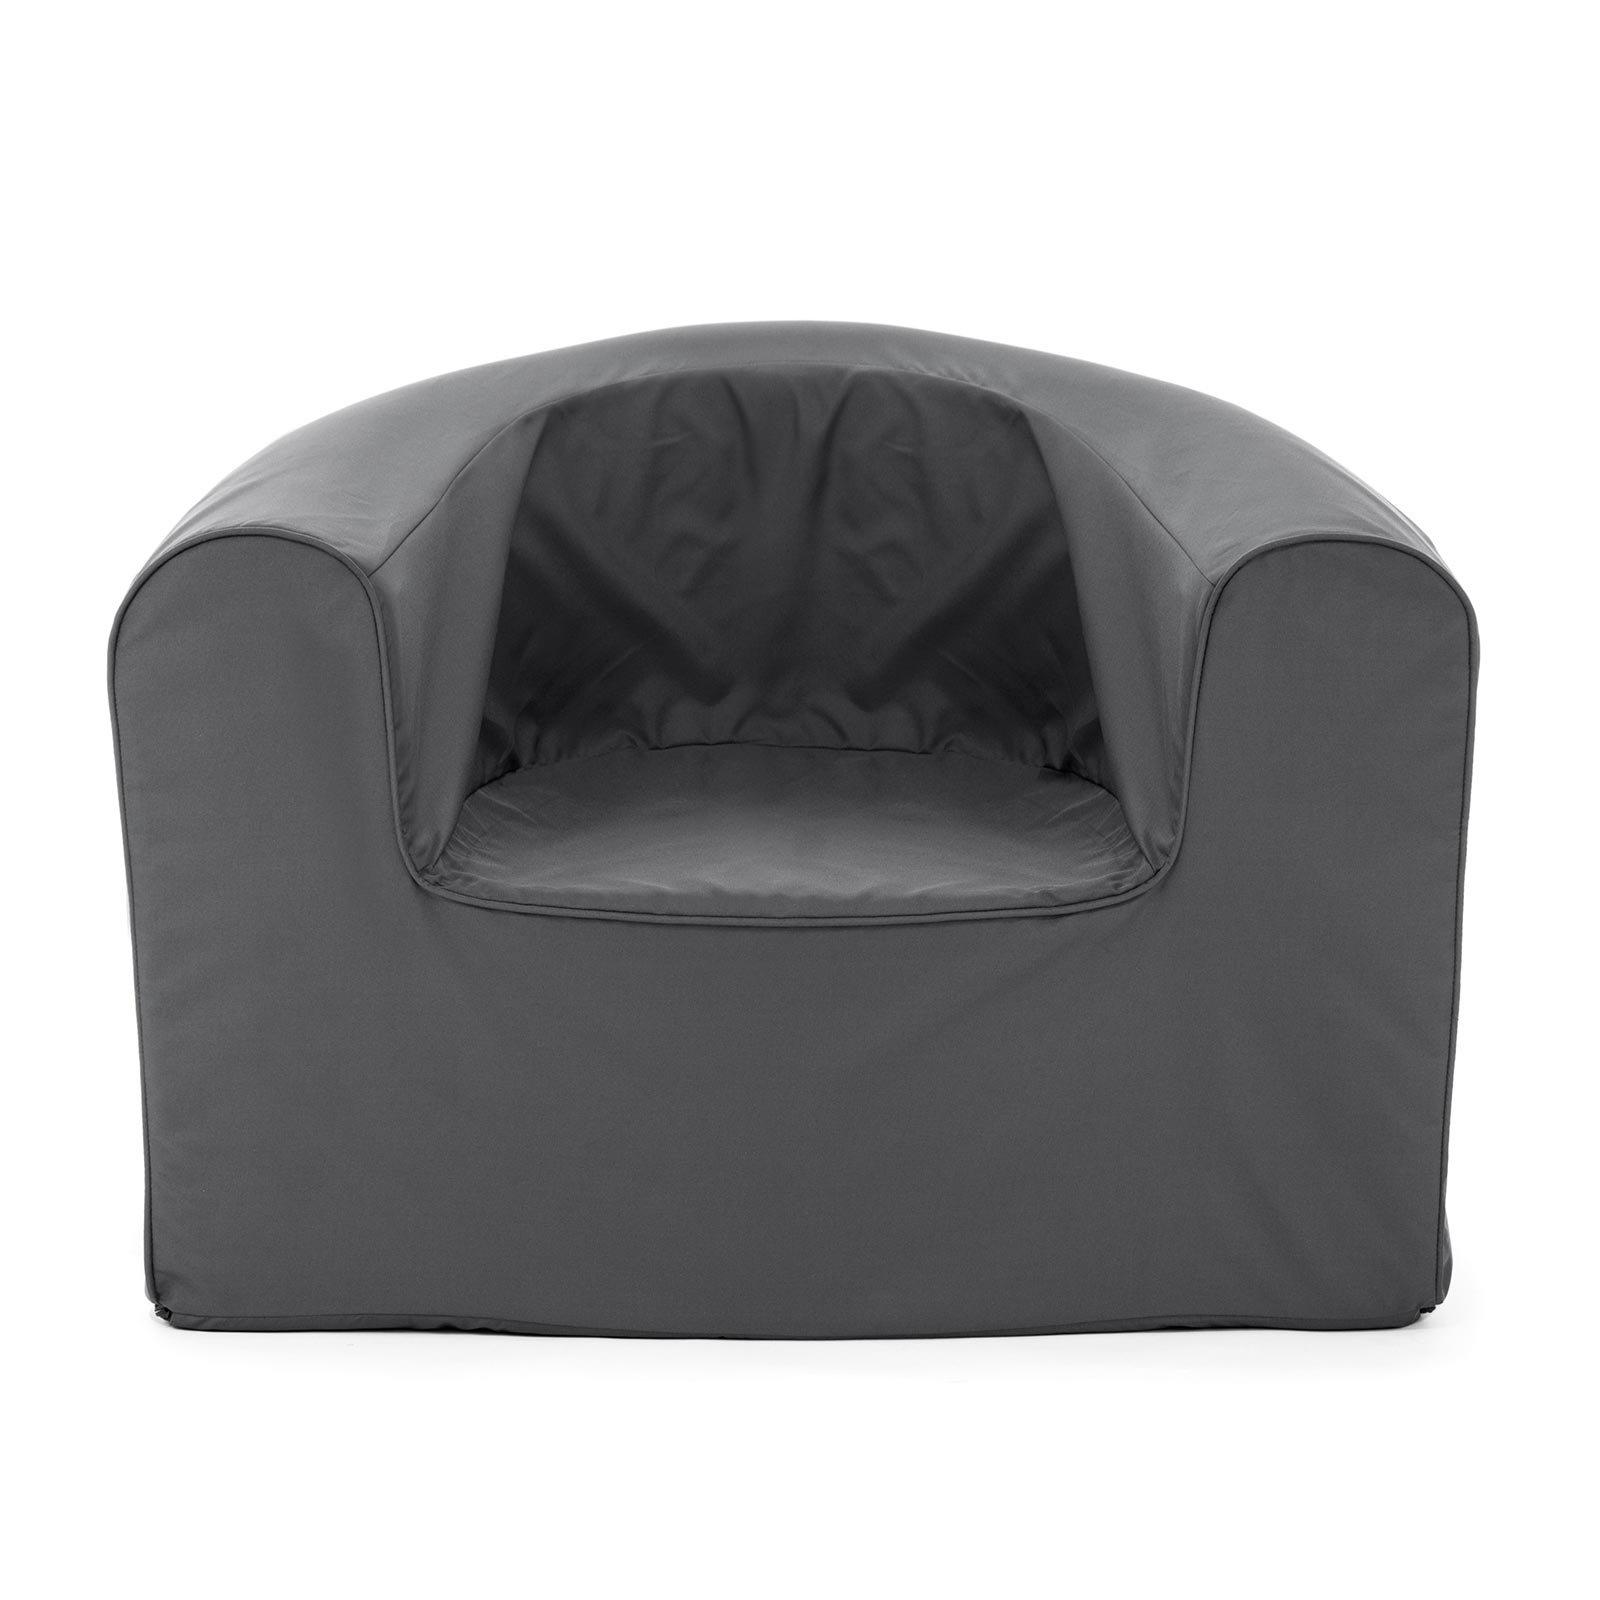 PopLounge Expandable Foam Furniture Armchair, Castlerock Gray, 35'' x 28'' x 26''